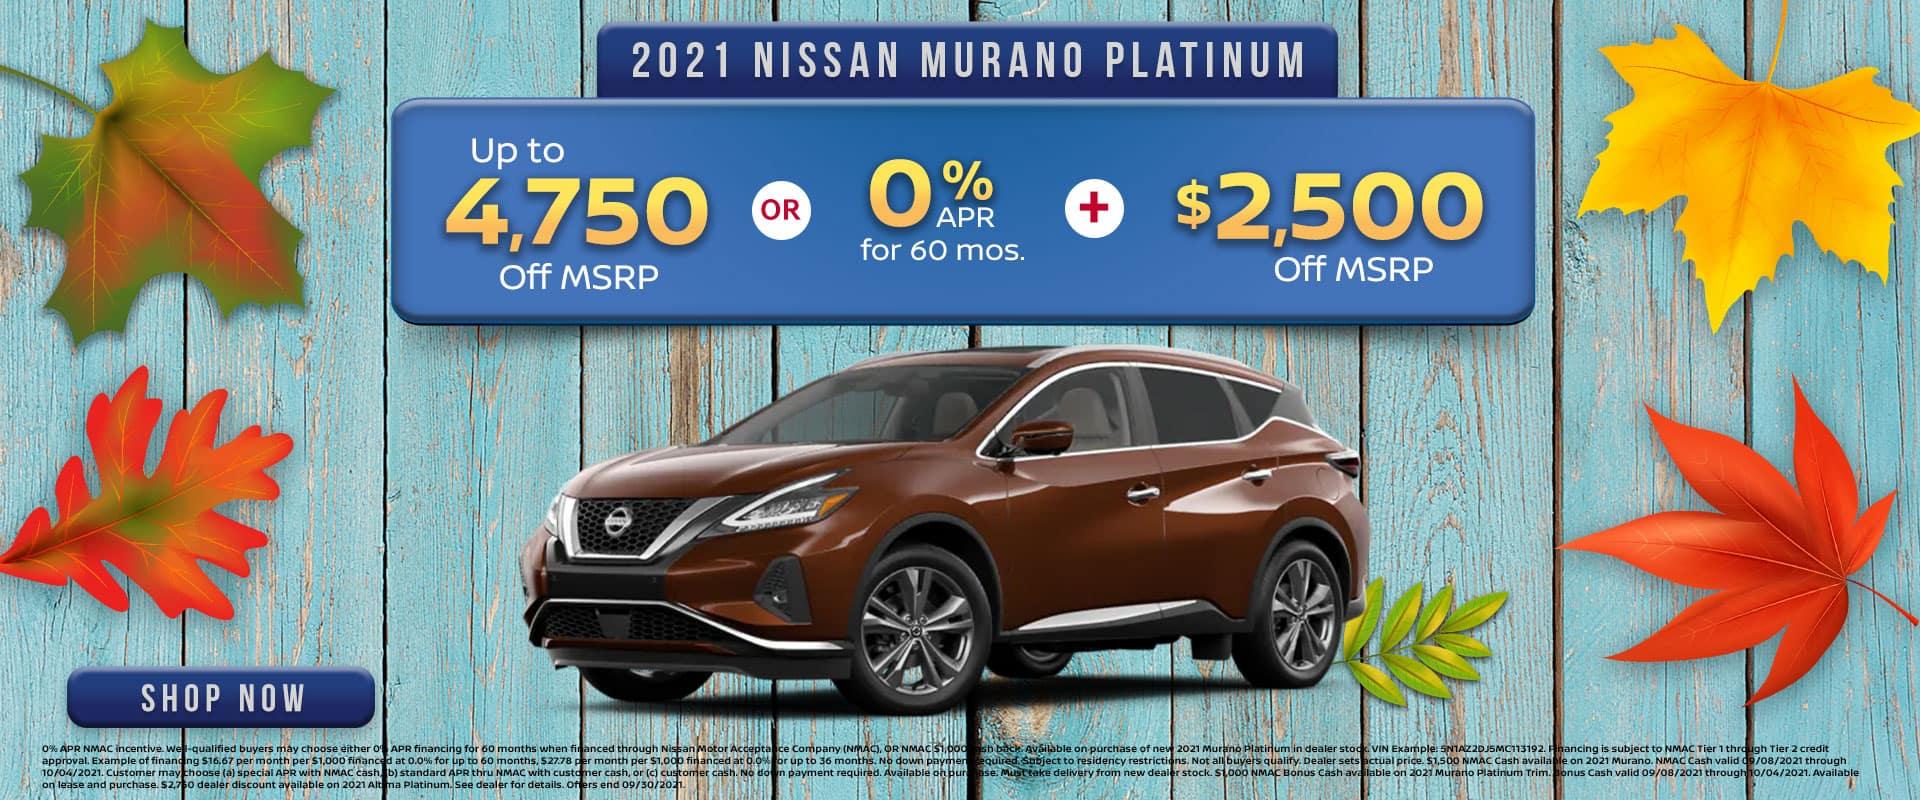 2021 Nissan Murano Platinum Offer in Greenville, TX